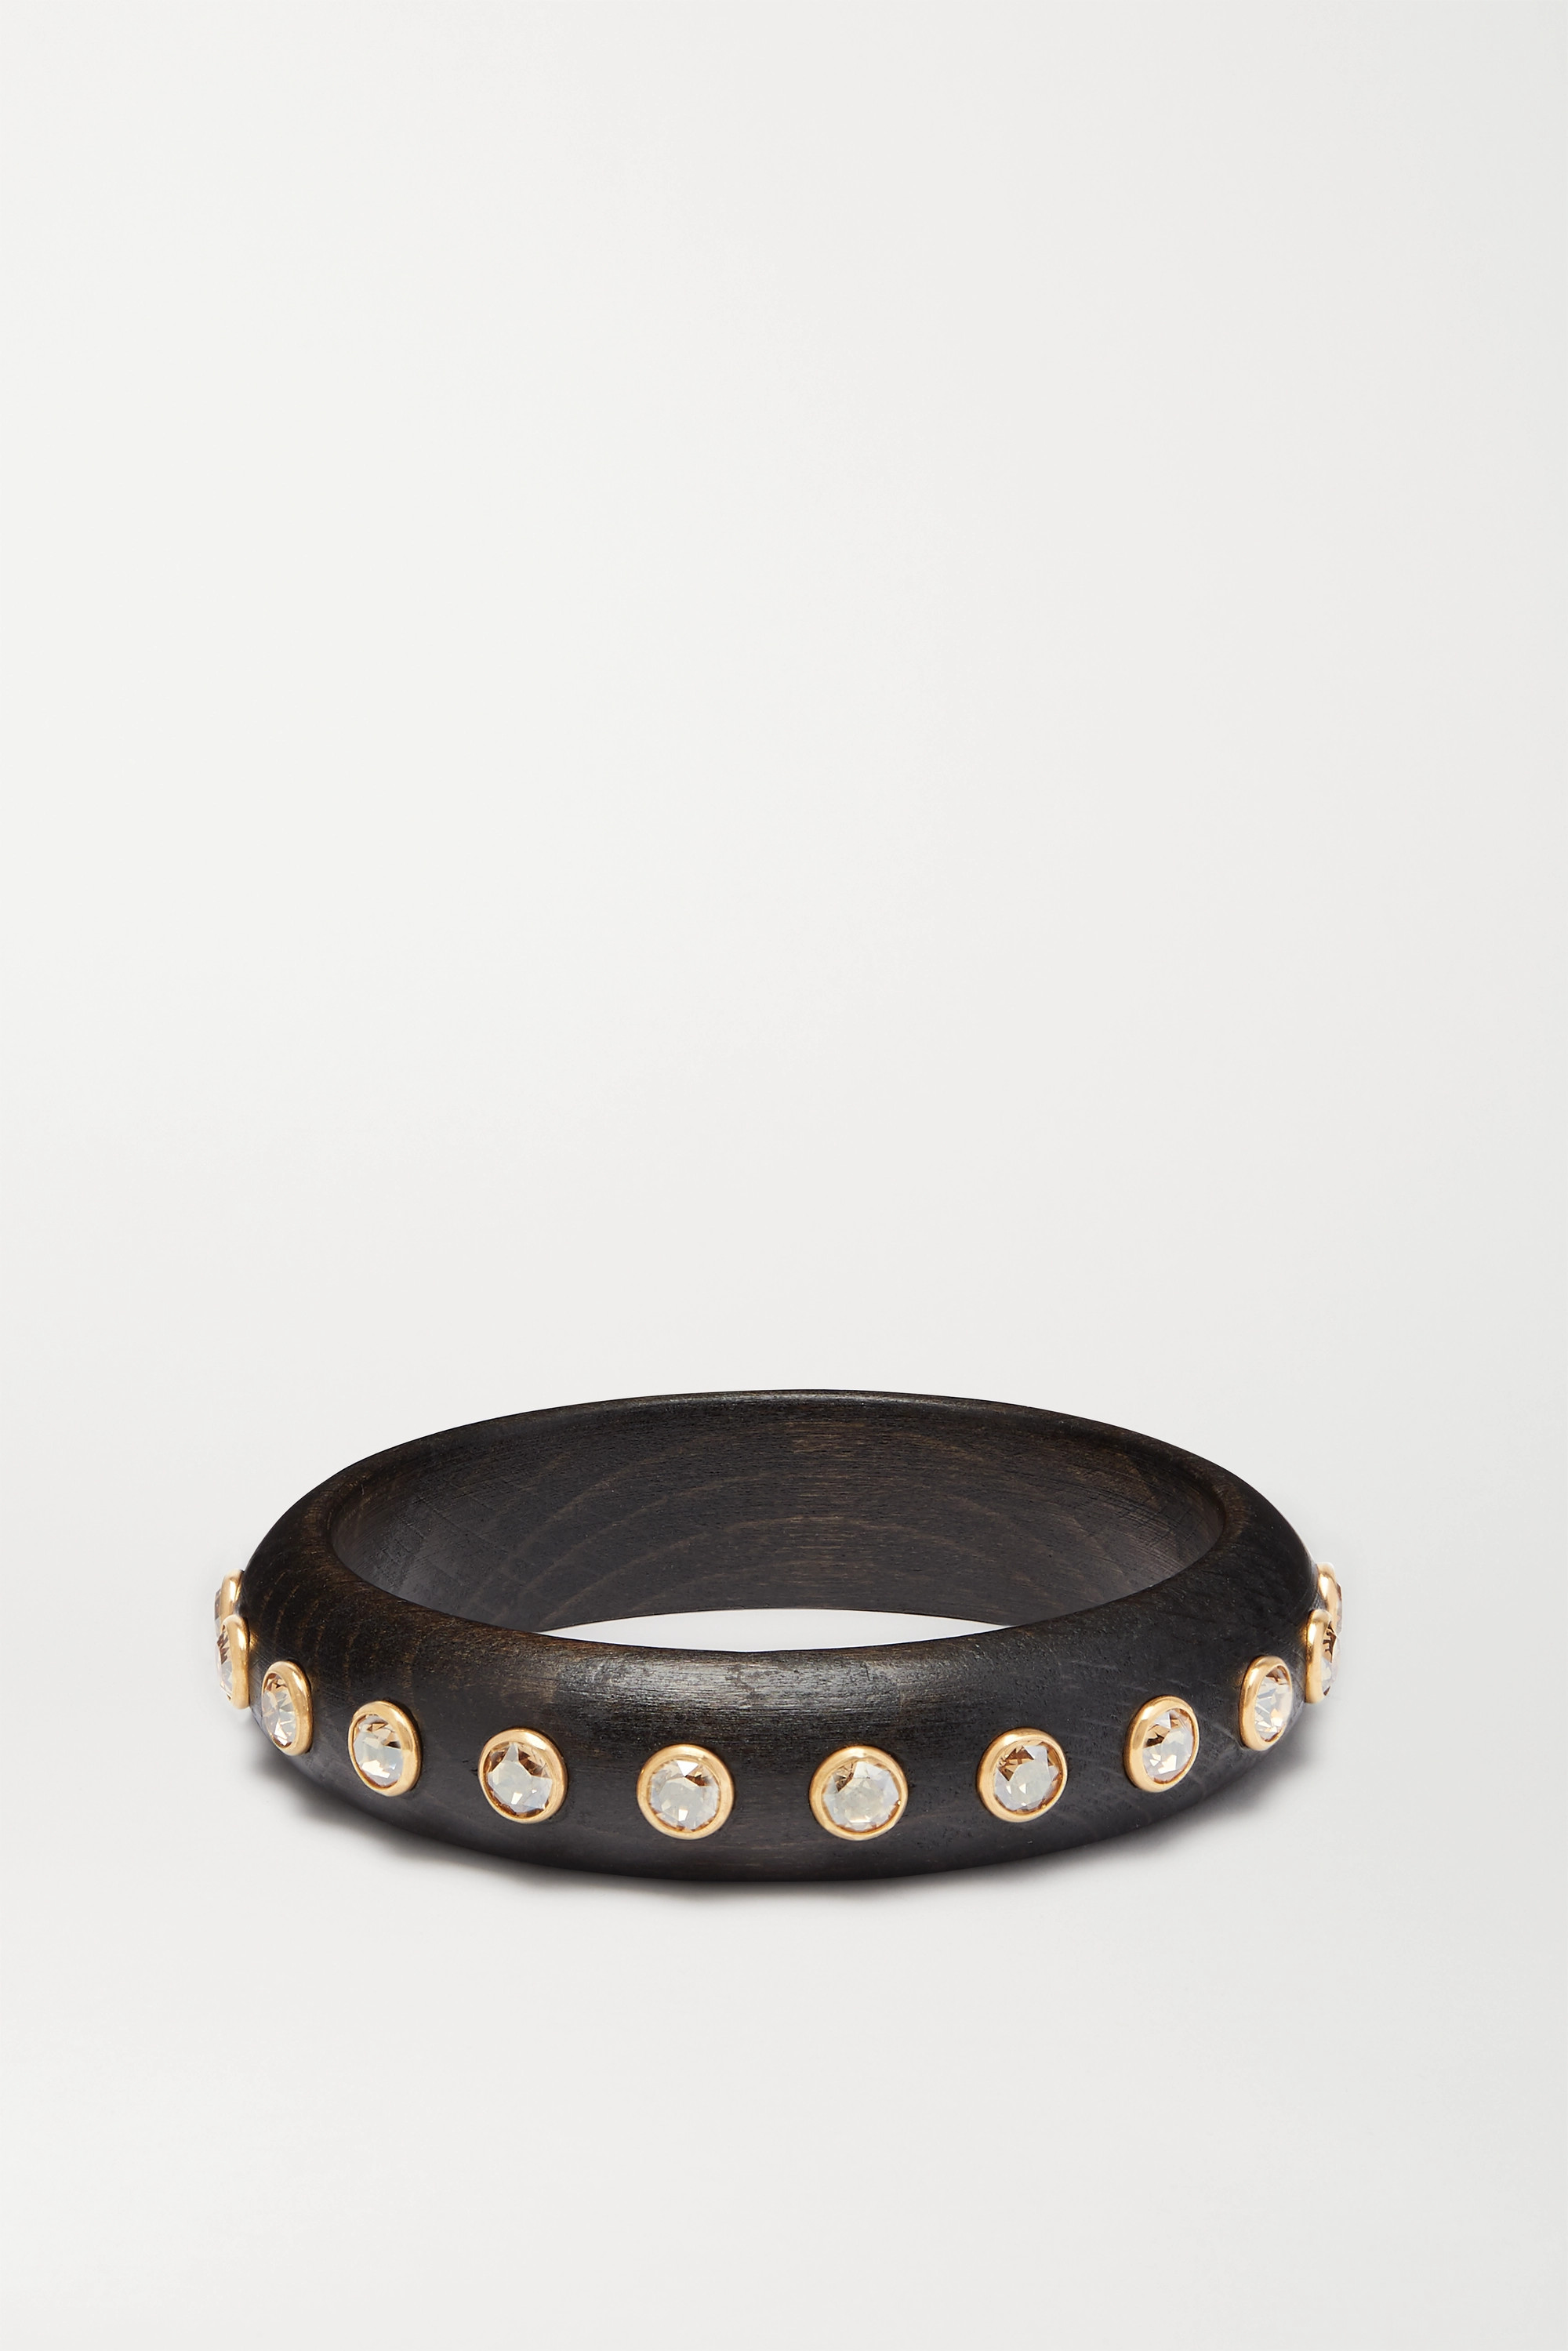 Dolce & Gabbana Gold-tone, wood and crystal bangle